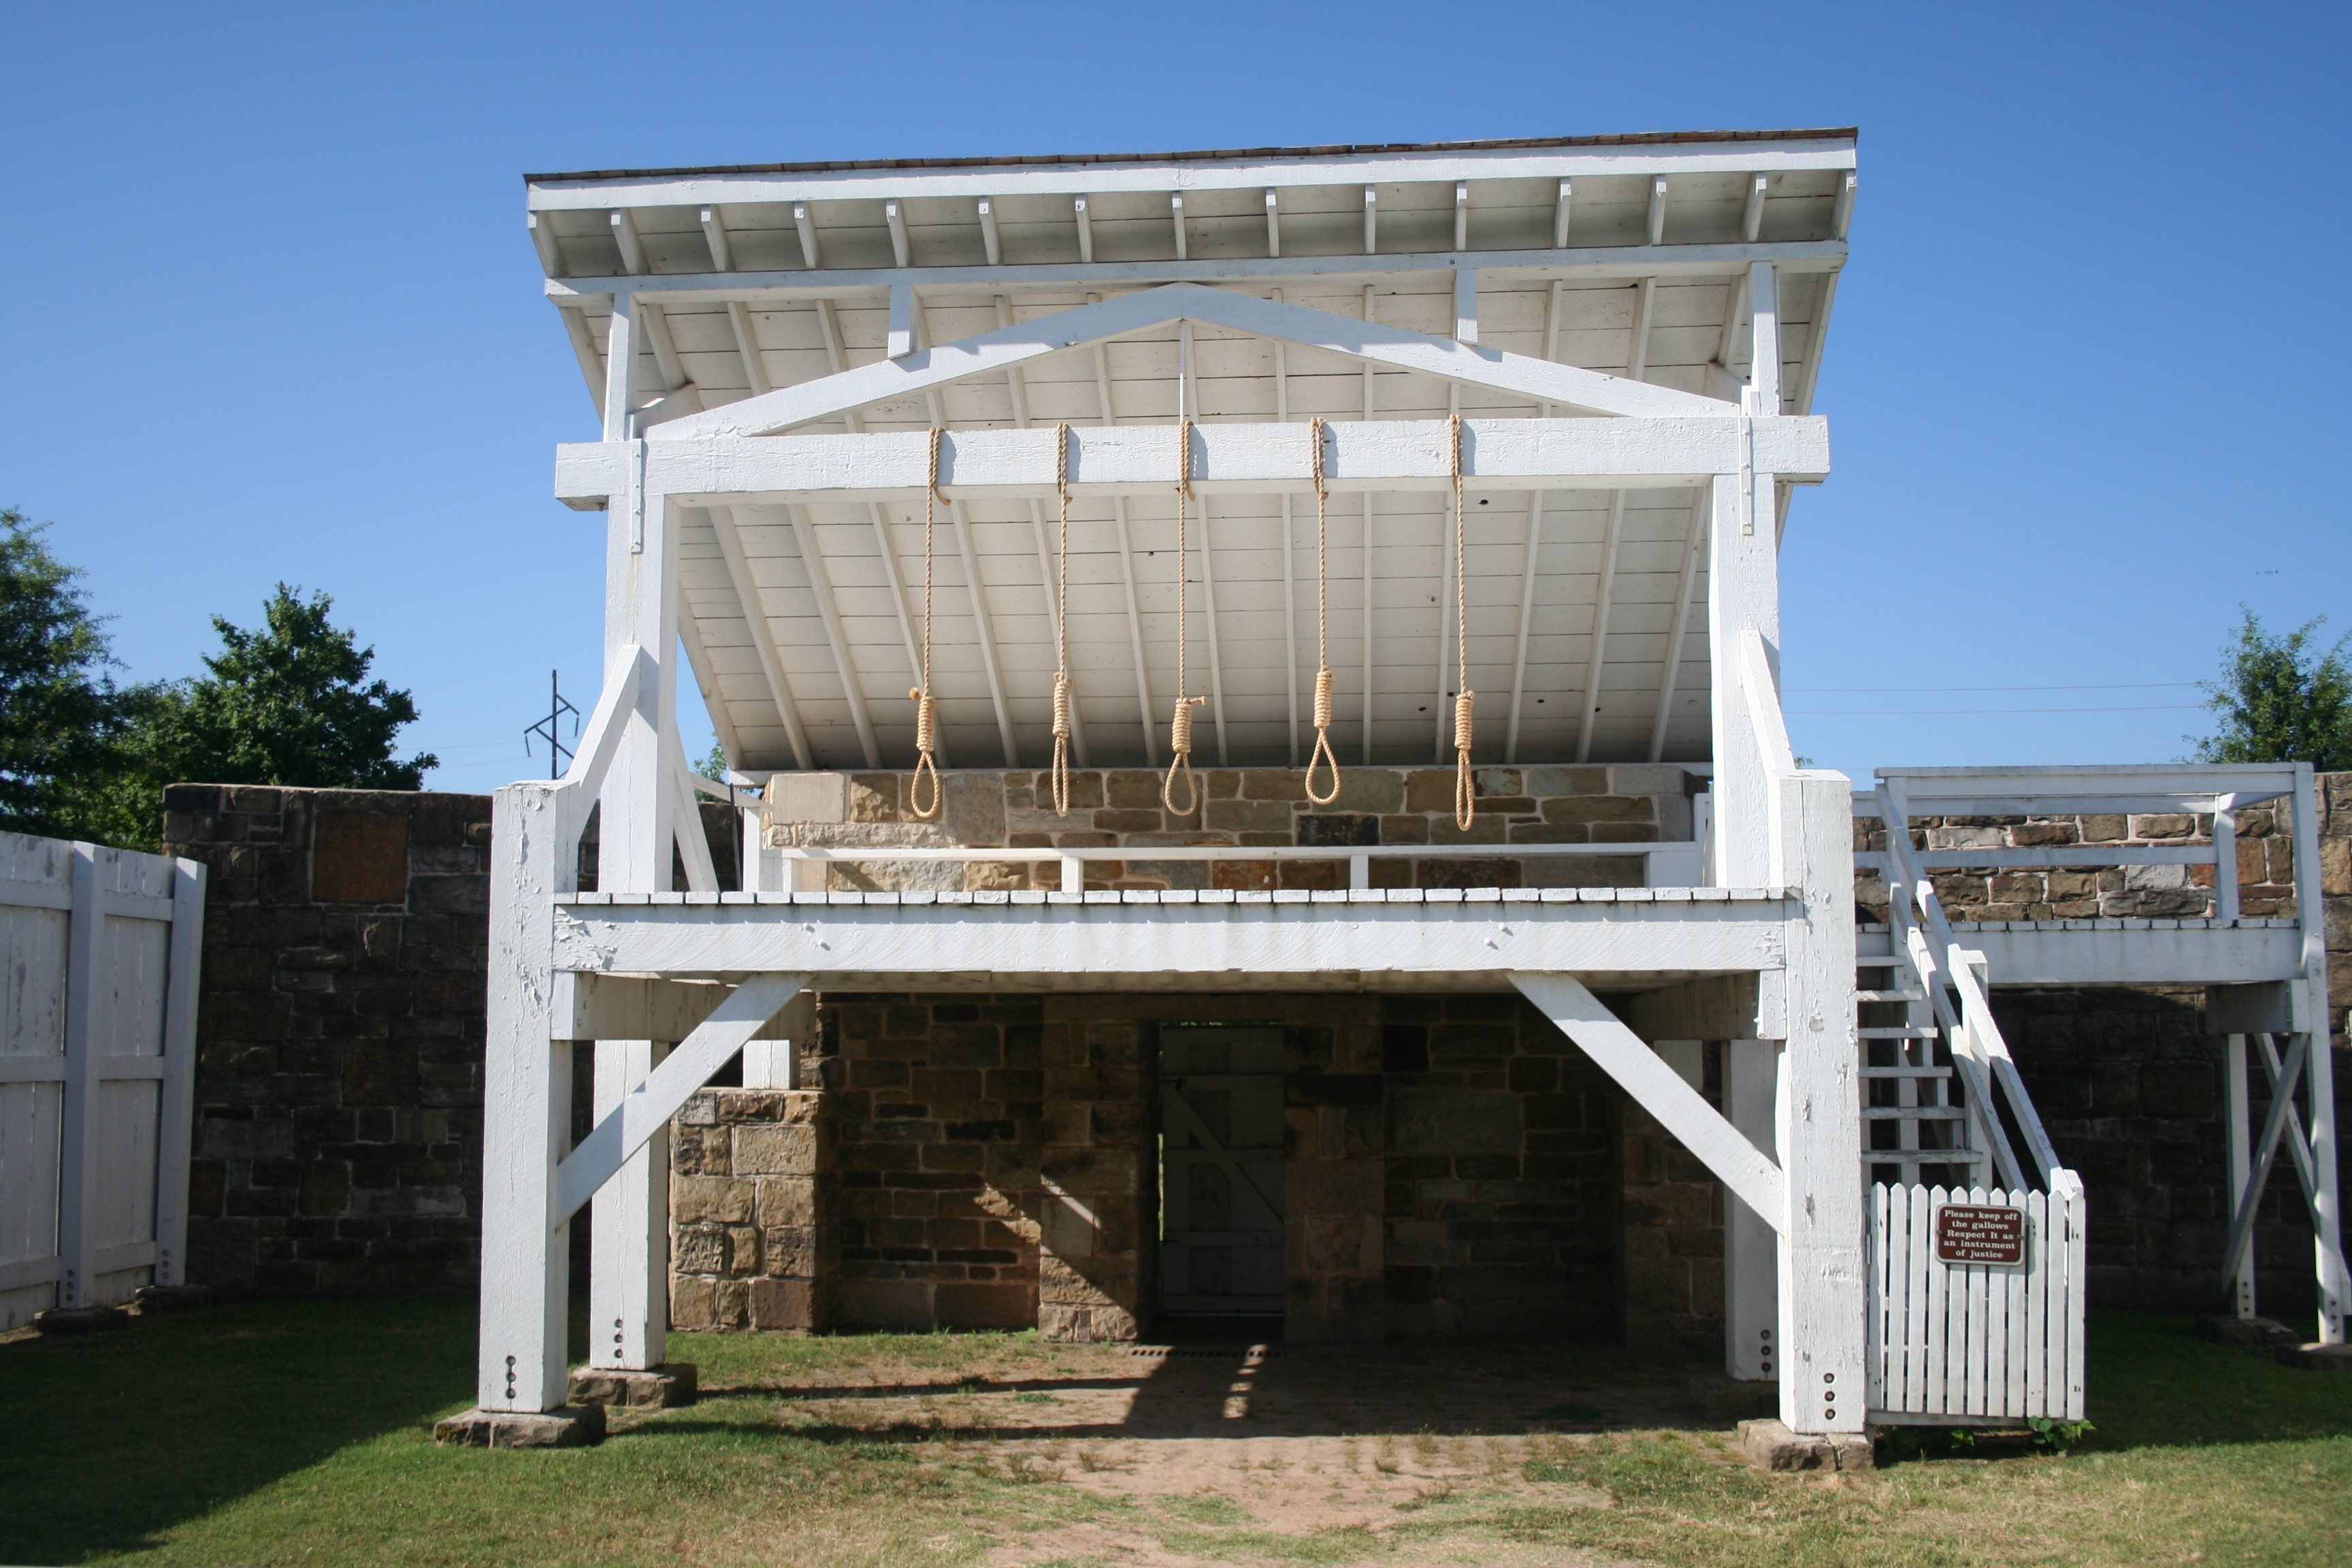 Ft. Smith gallows.